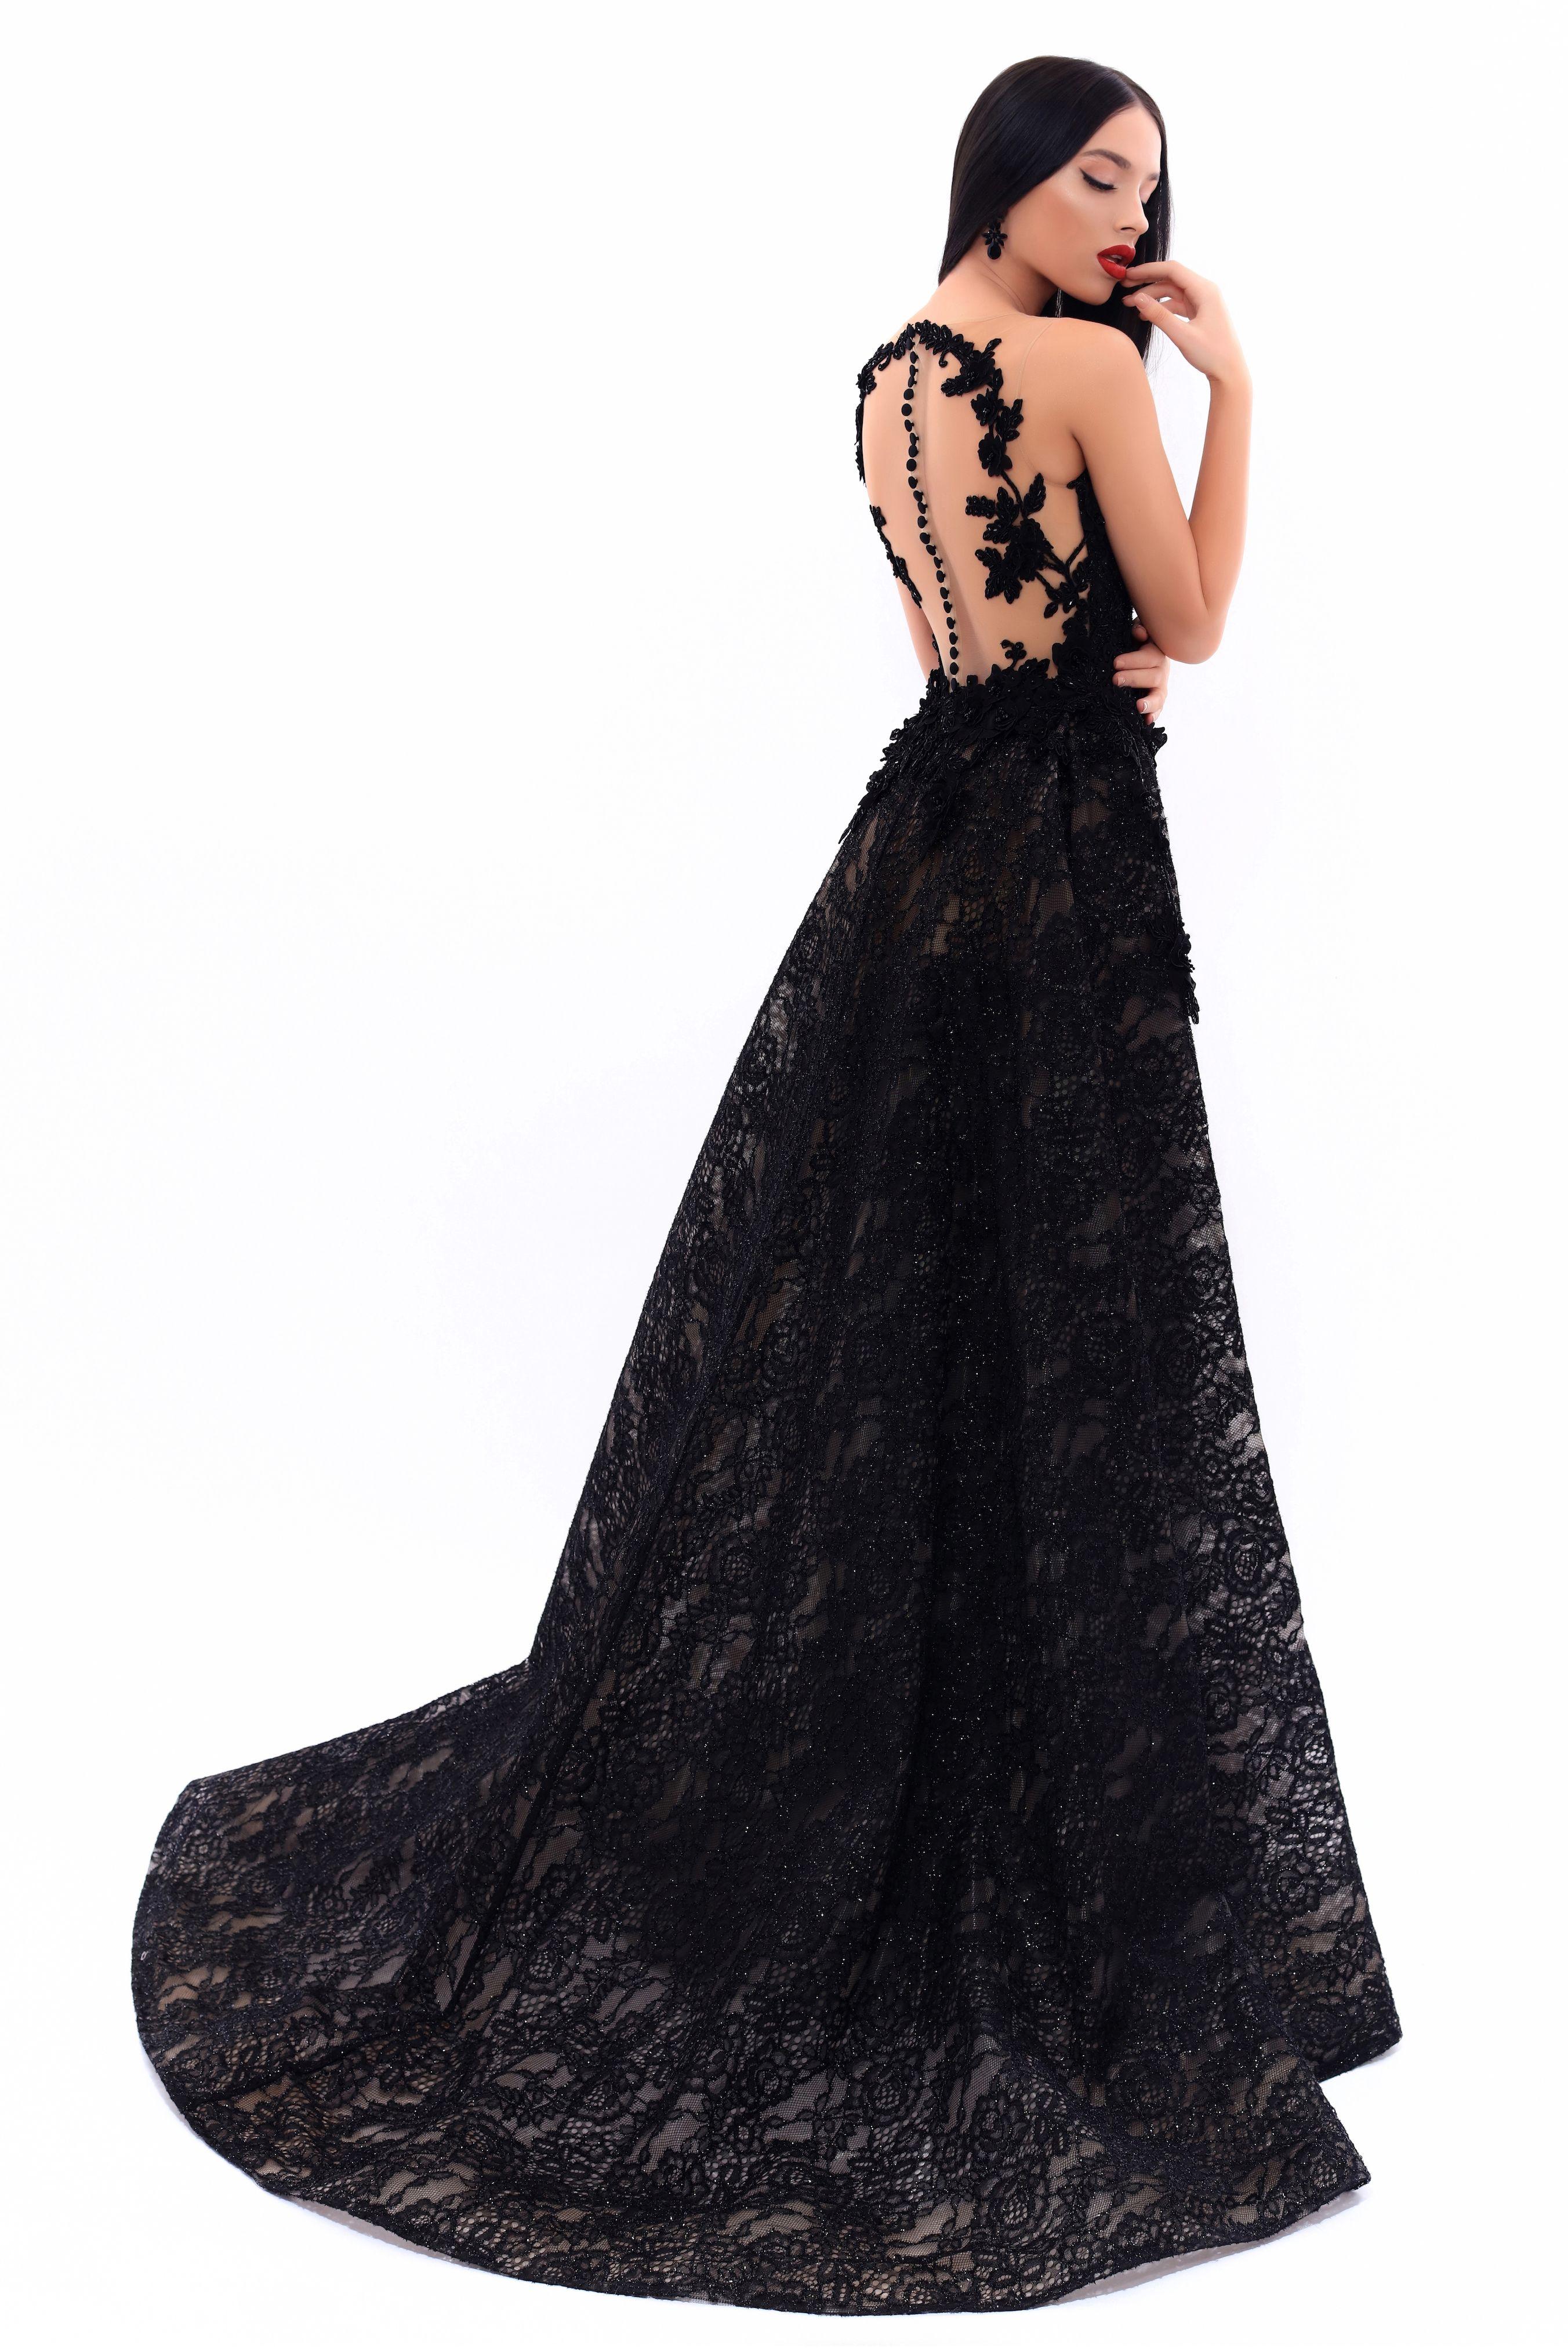 Wine Evening Dress – Fashion dresses